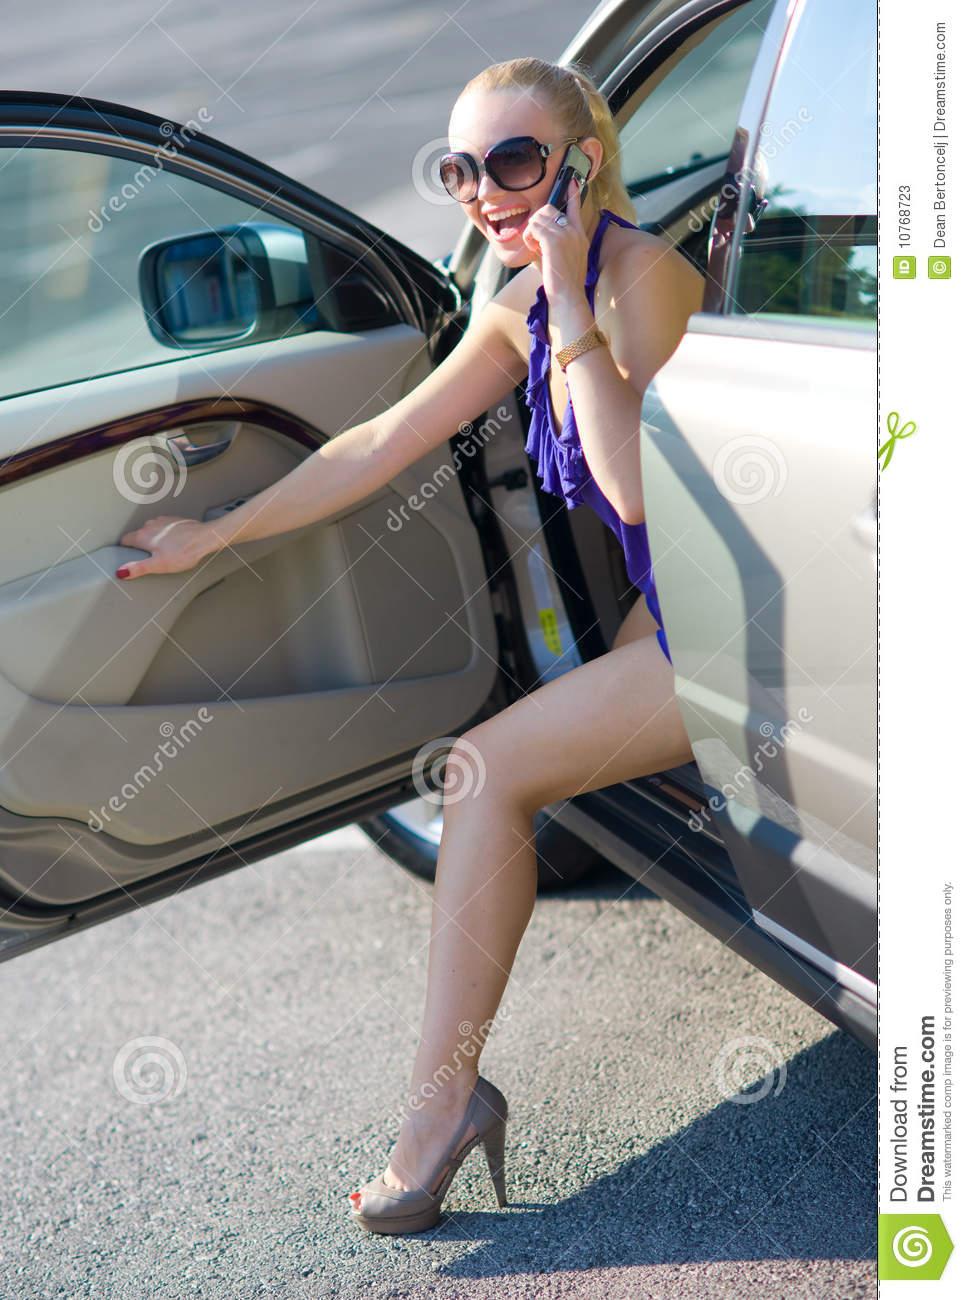 Pin Legs Women Cars Russia Wallpapers Download 967x1300